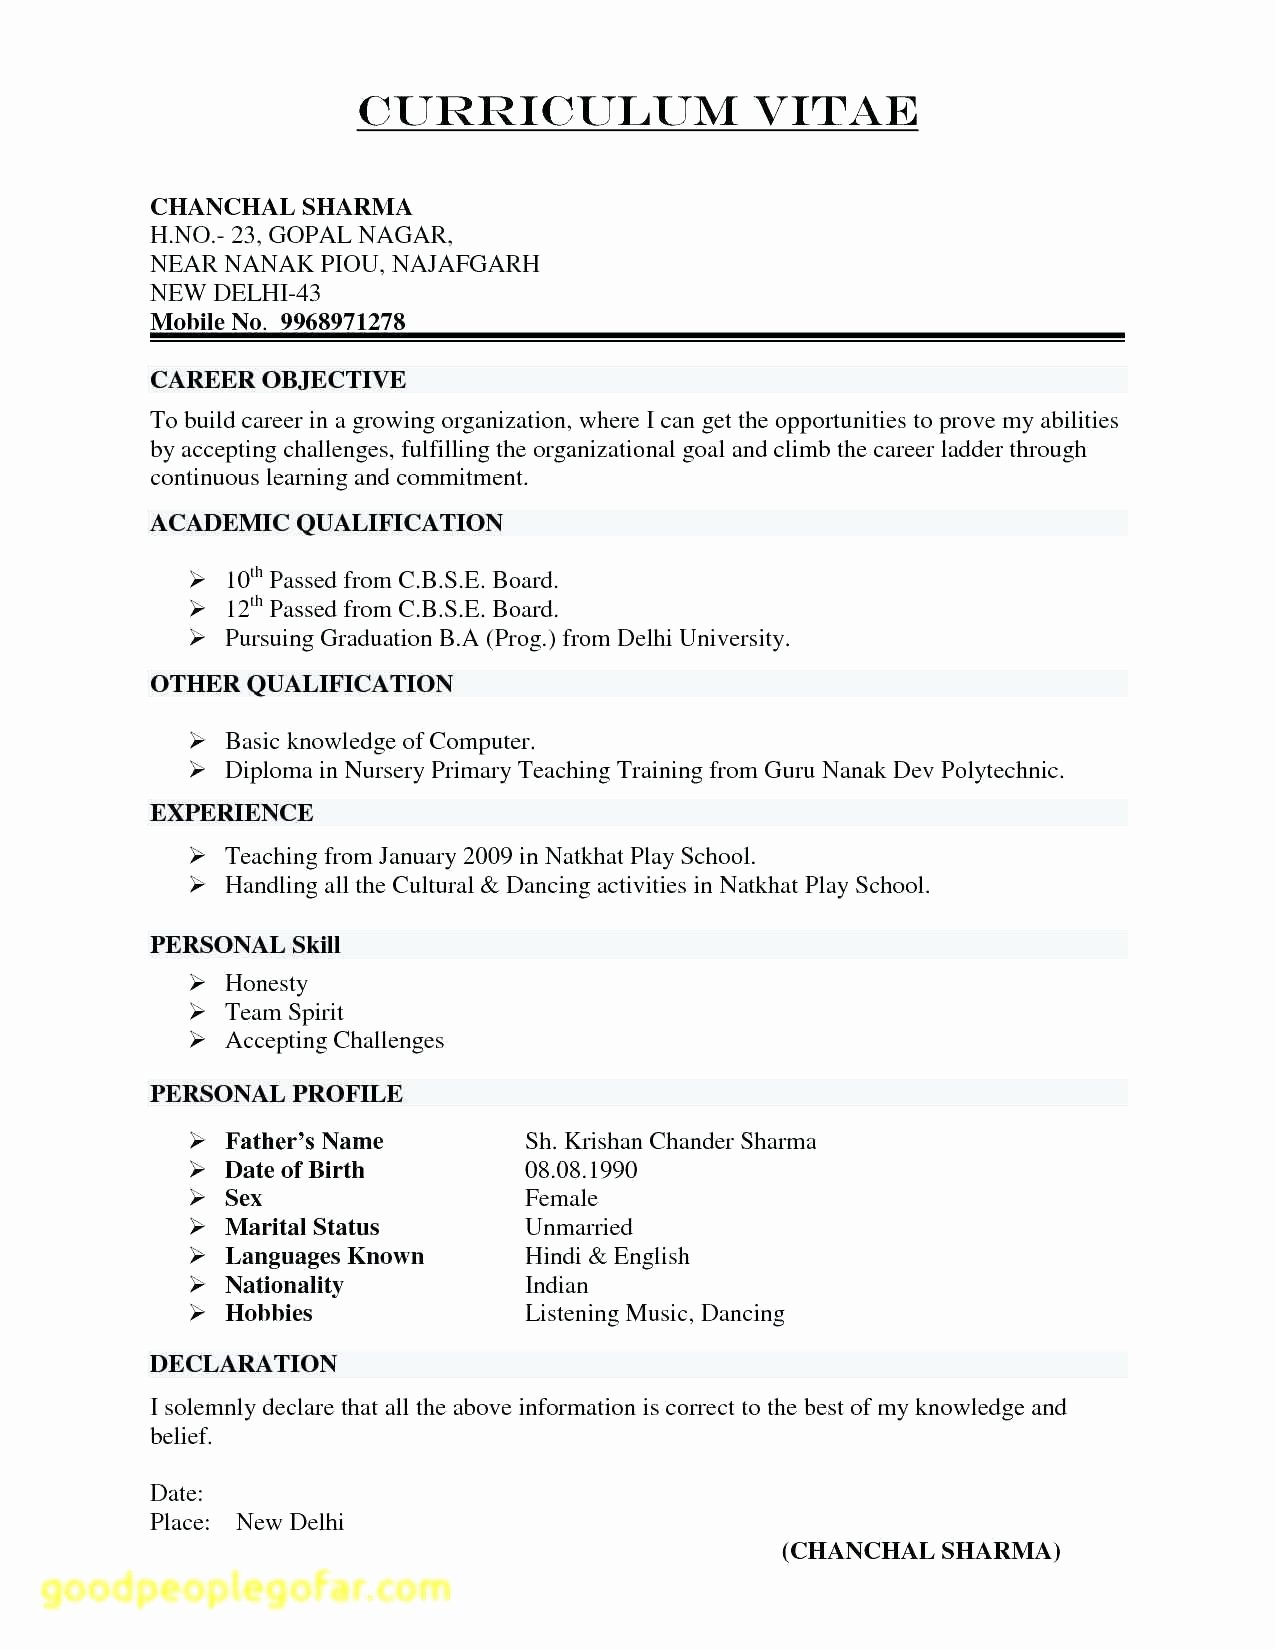 Nursing Peer Review Template Beautiful Peer Evaluation form – Courselist